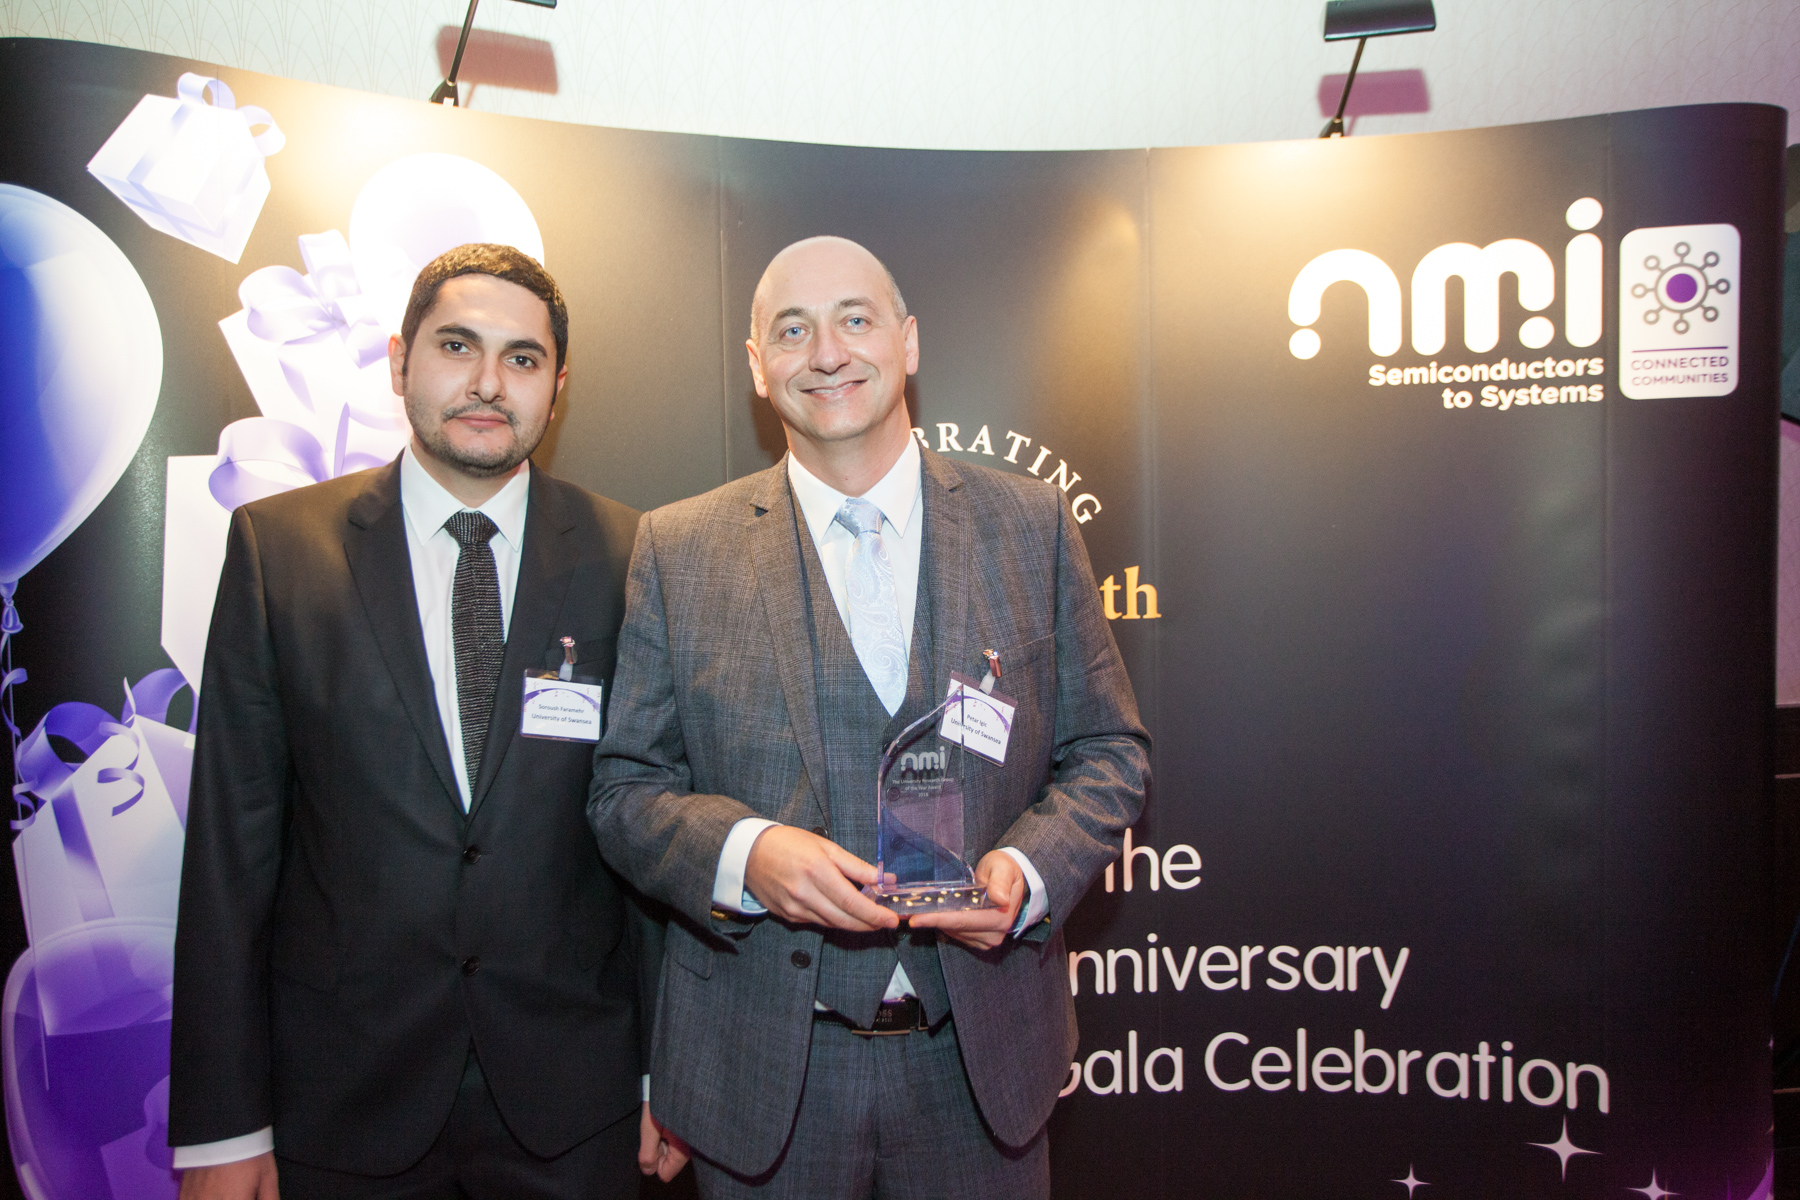 Dr Soroush Faramehr and Dr Petar Igic receive the 2016 NMI University Research